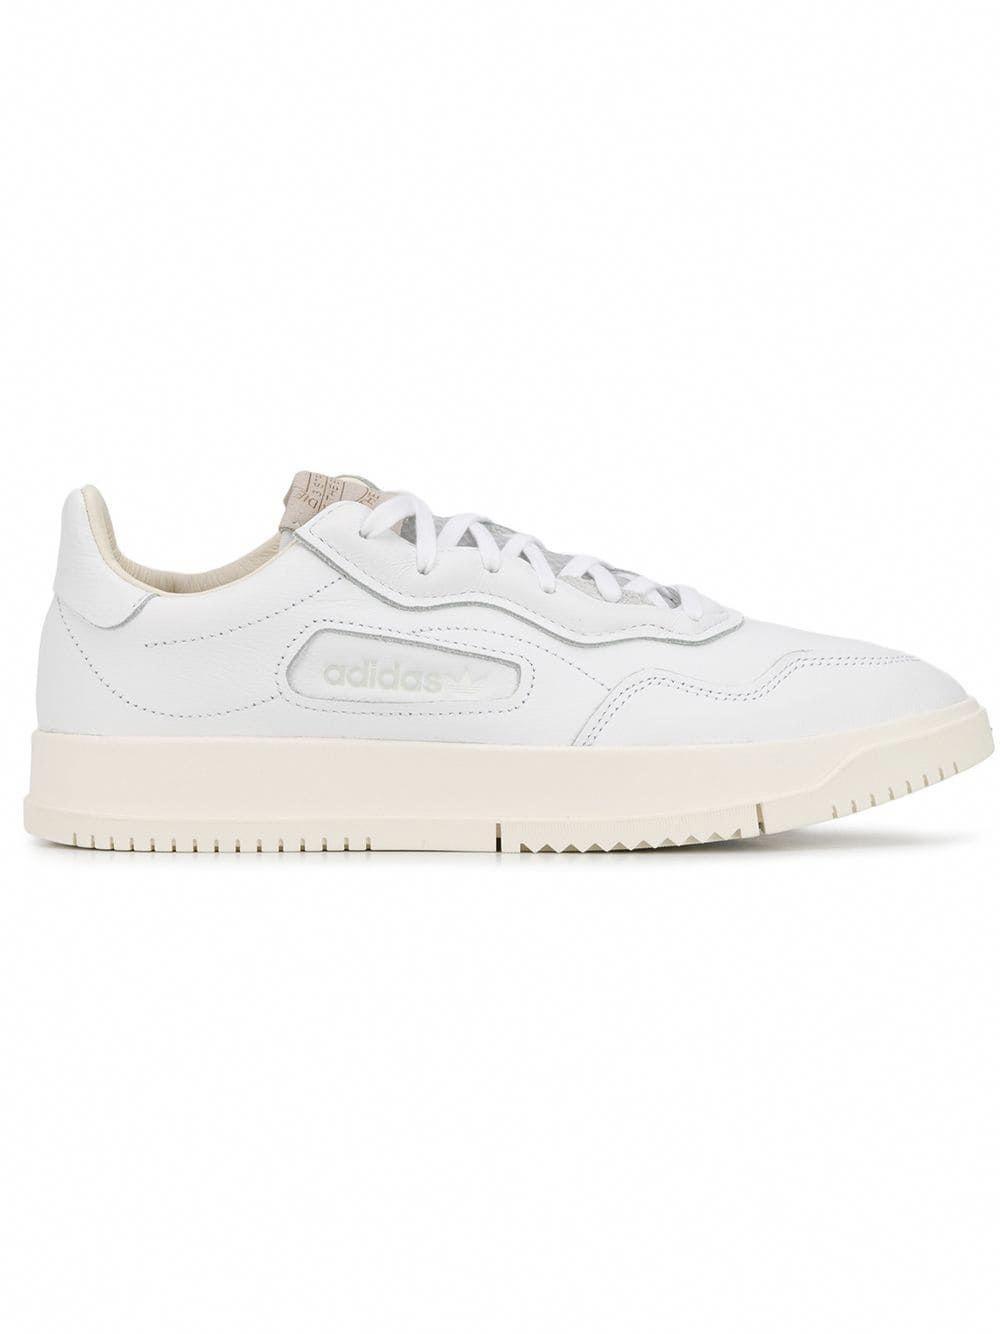 396a2033bd71 ADIDAS ORIGINALS ADIDAS LOW-TOP SNEAKERS - WHITE.  adidasoriginals  shoes   MensFashionSneakers